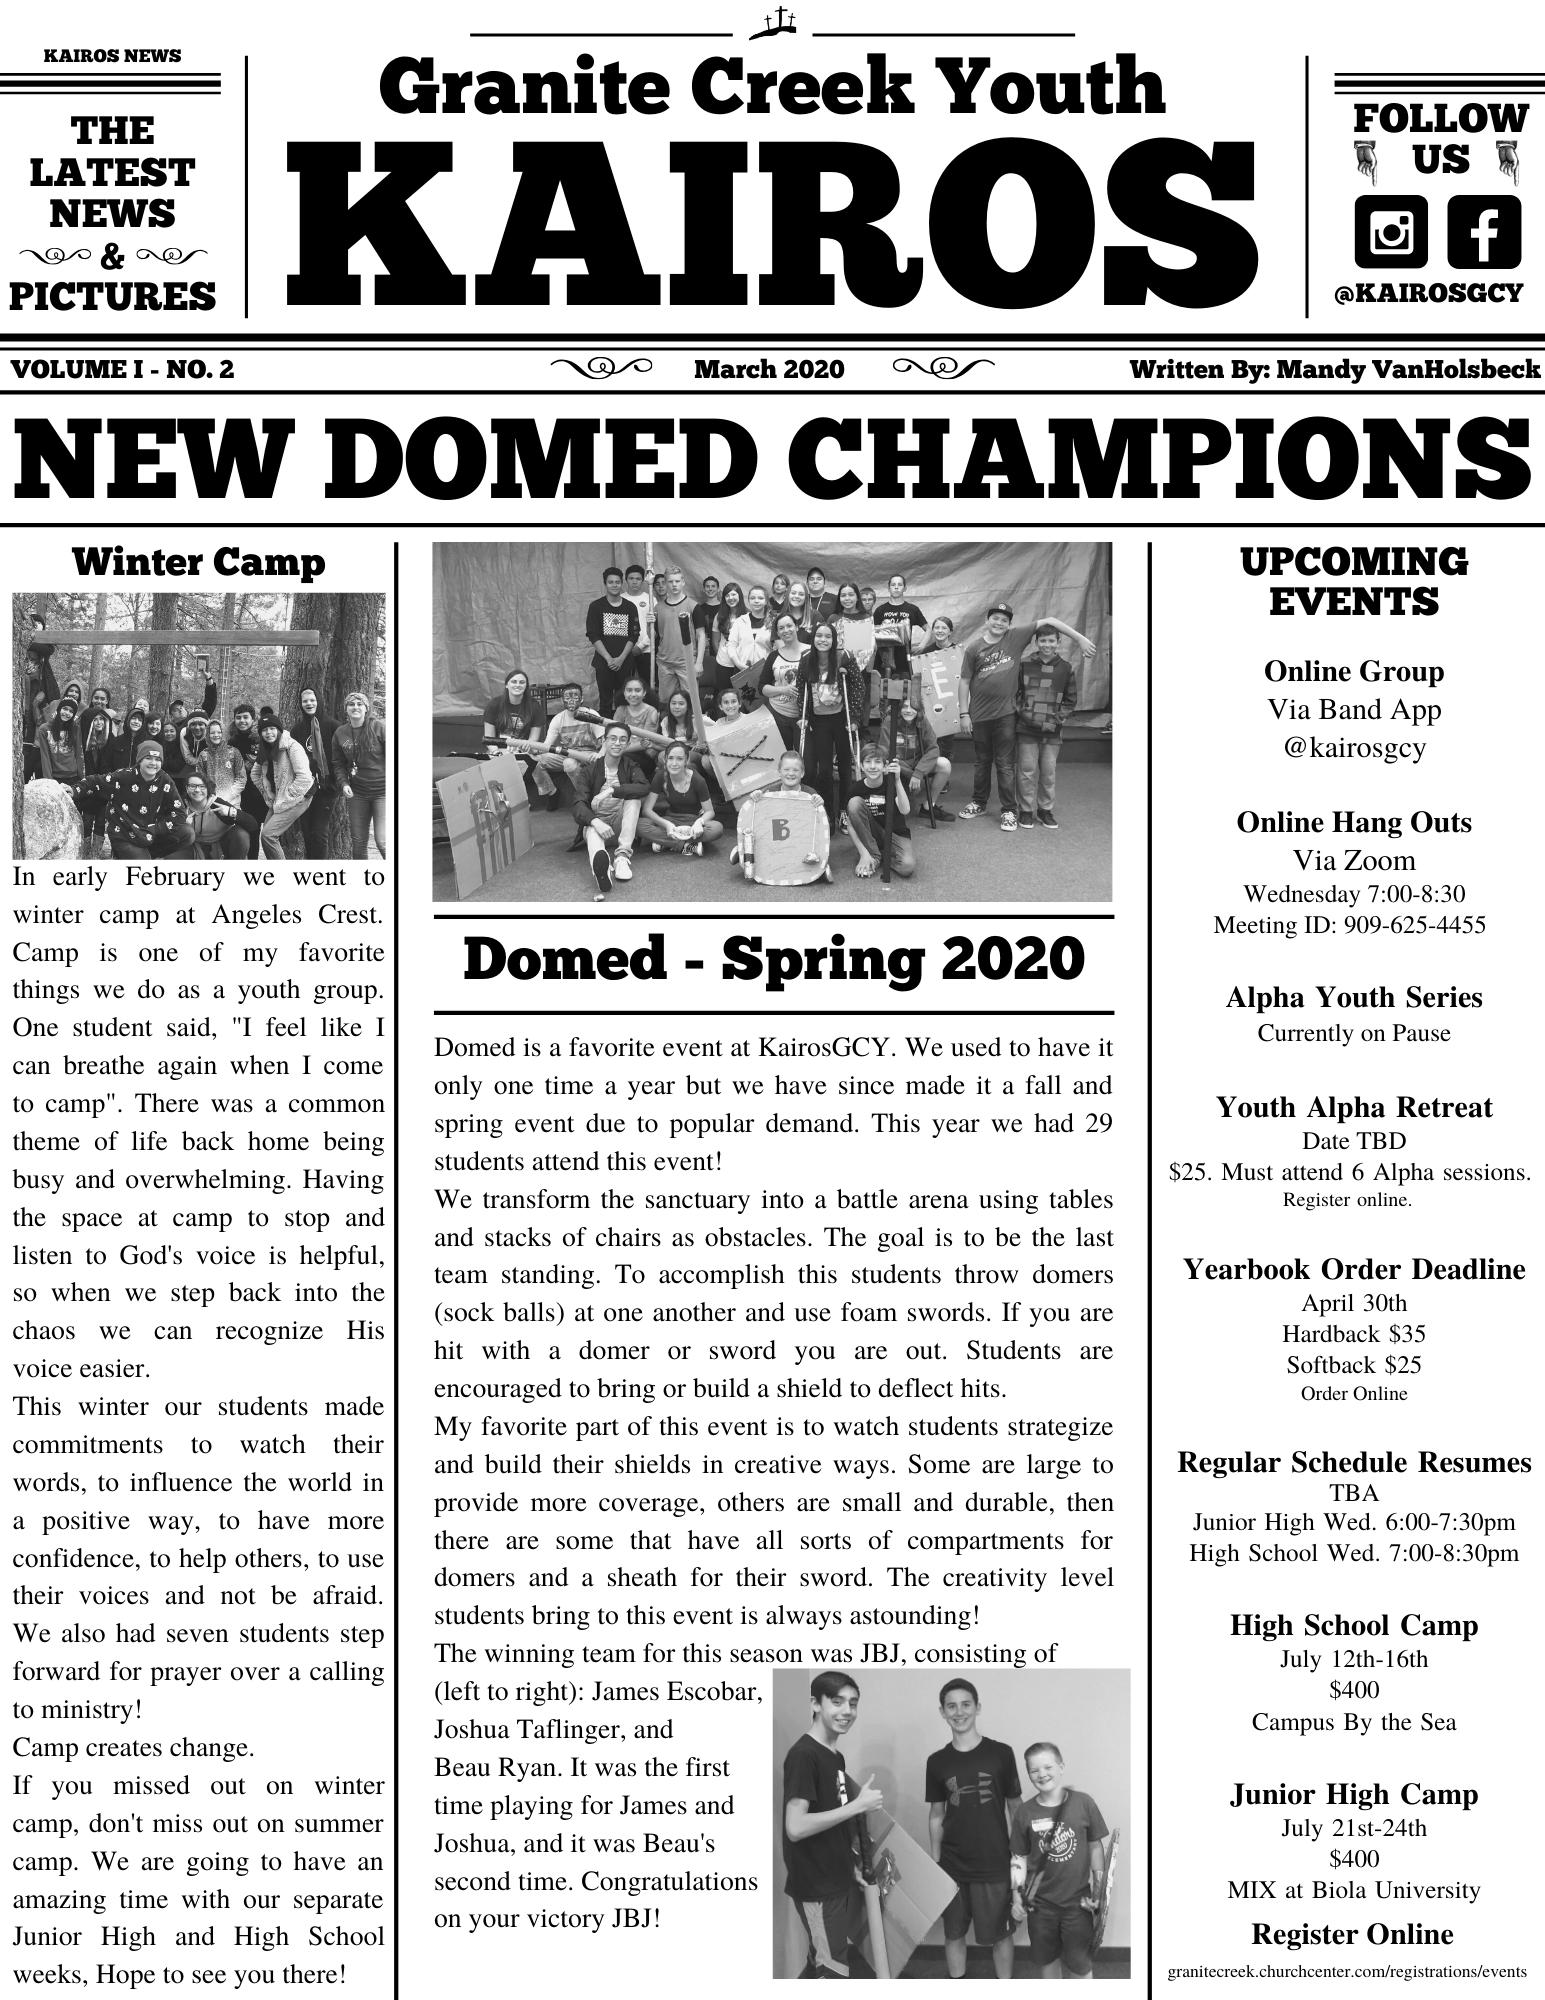 kairos-march-2020-newsletter_775